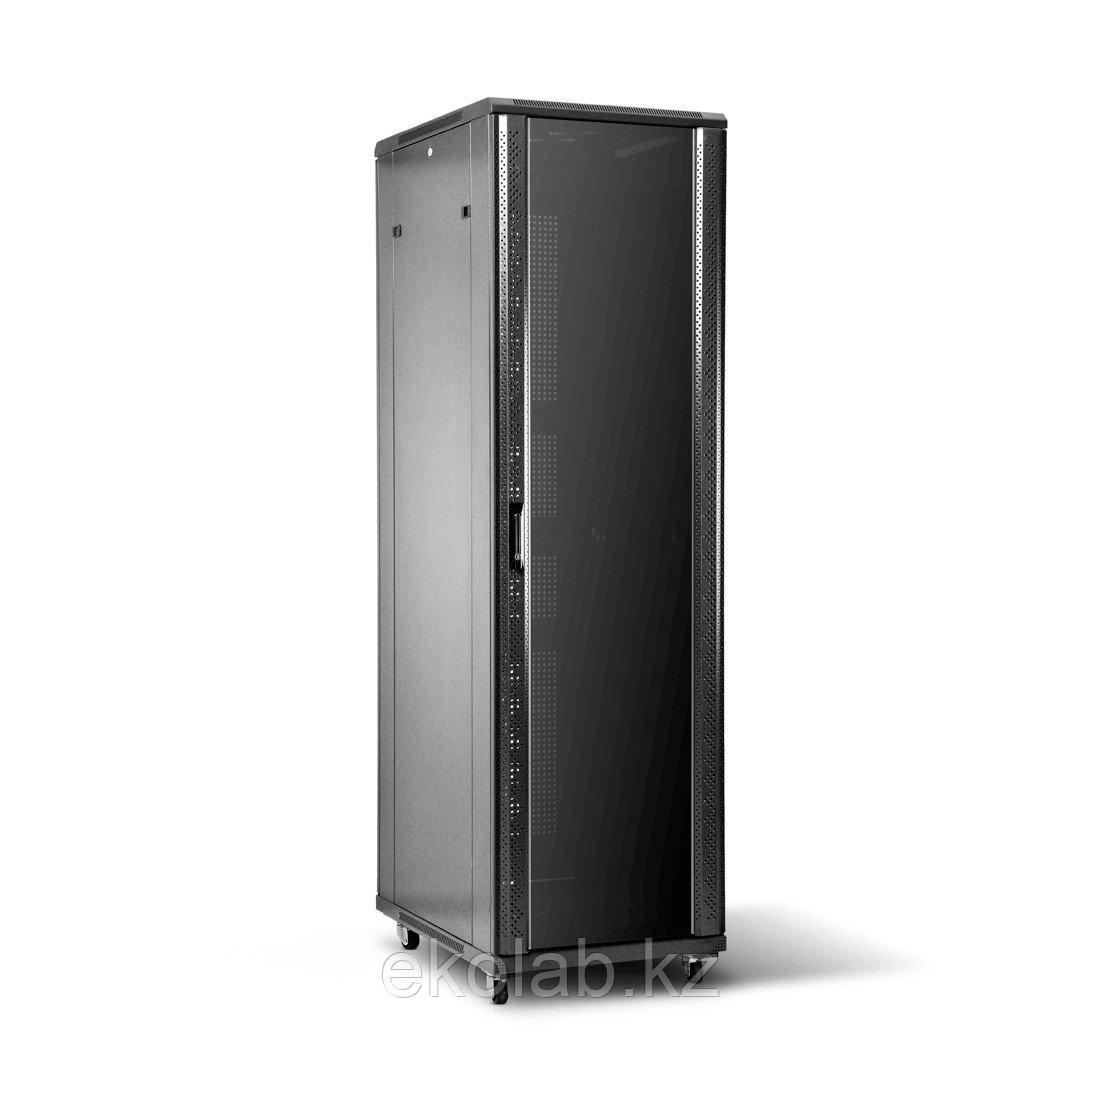 Шкаф серверный SHIP 601S.6615.24.100 15U 600*600*800 мм